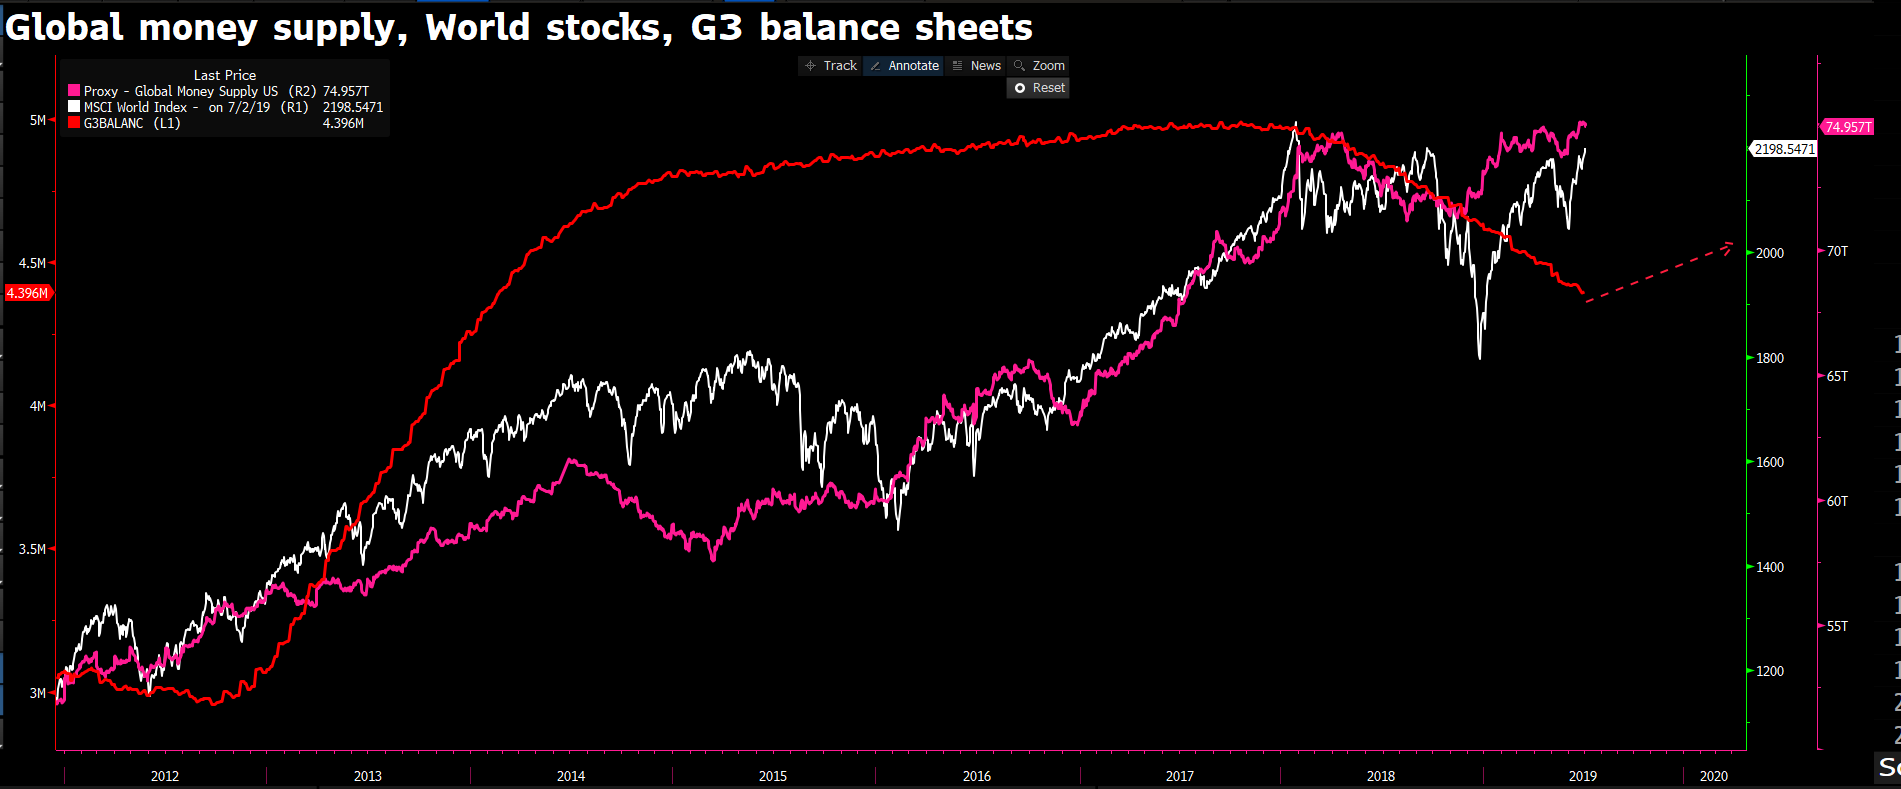 Global money supply, world stocks and G3 balance sheets